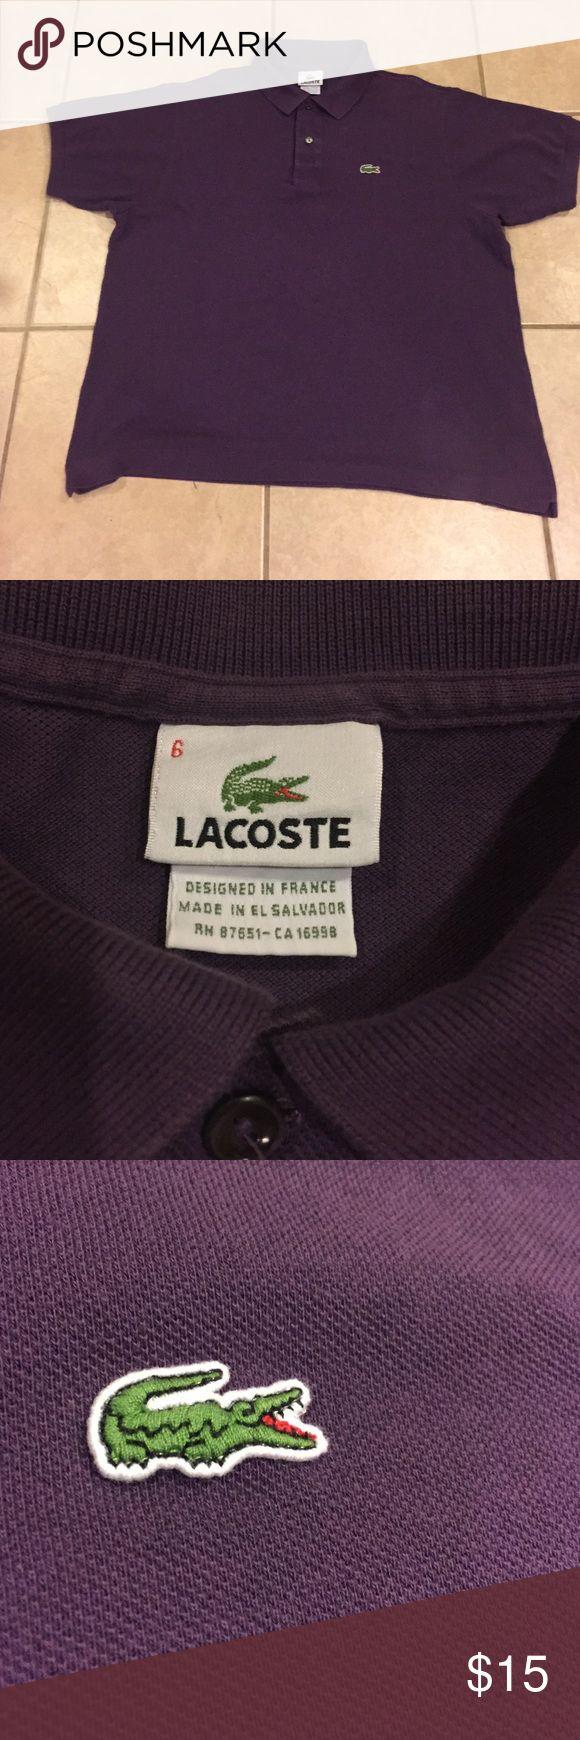 Men's Lacoste Polo shirt size 6 (large) EUC mens lacoste polo shirt size 6. (Large) purple plum. Lacoste Shirts Polos